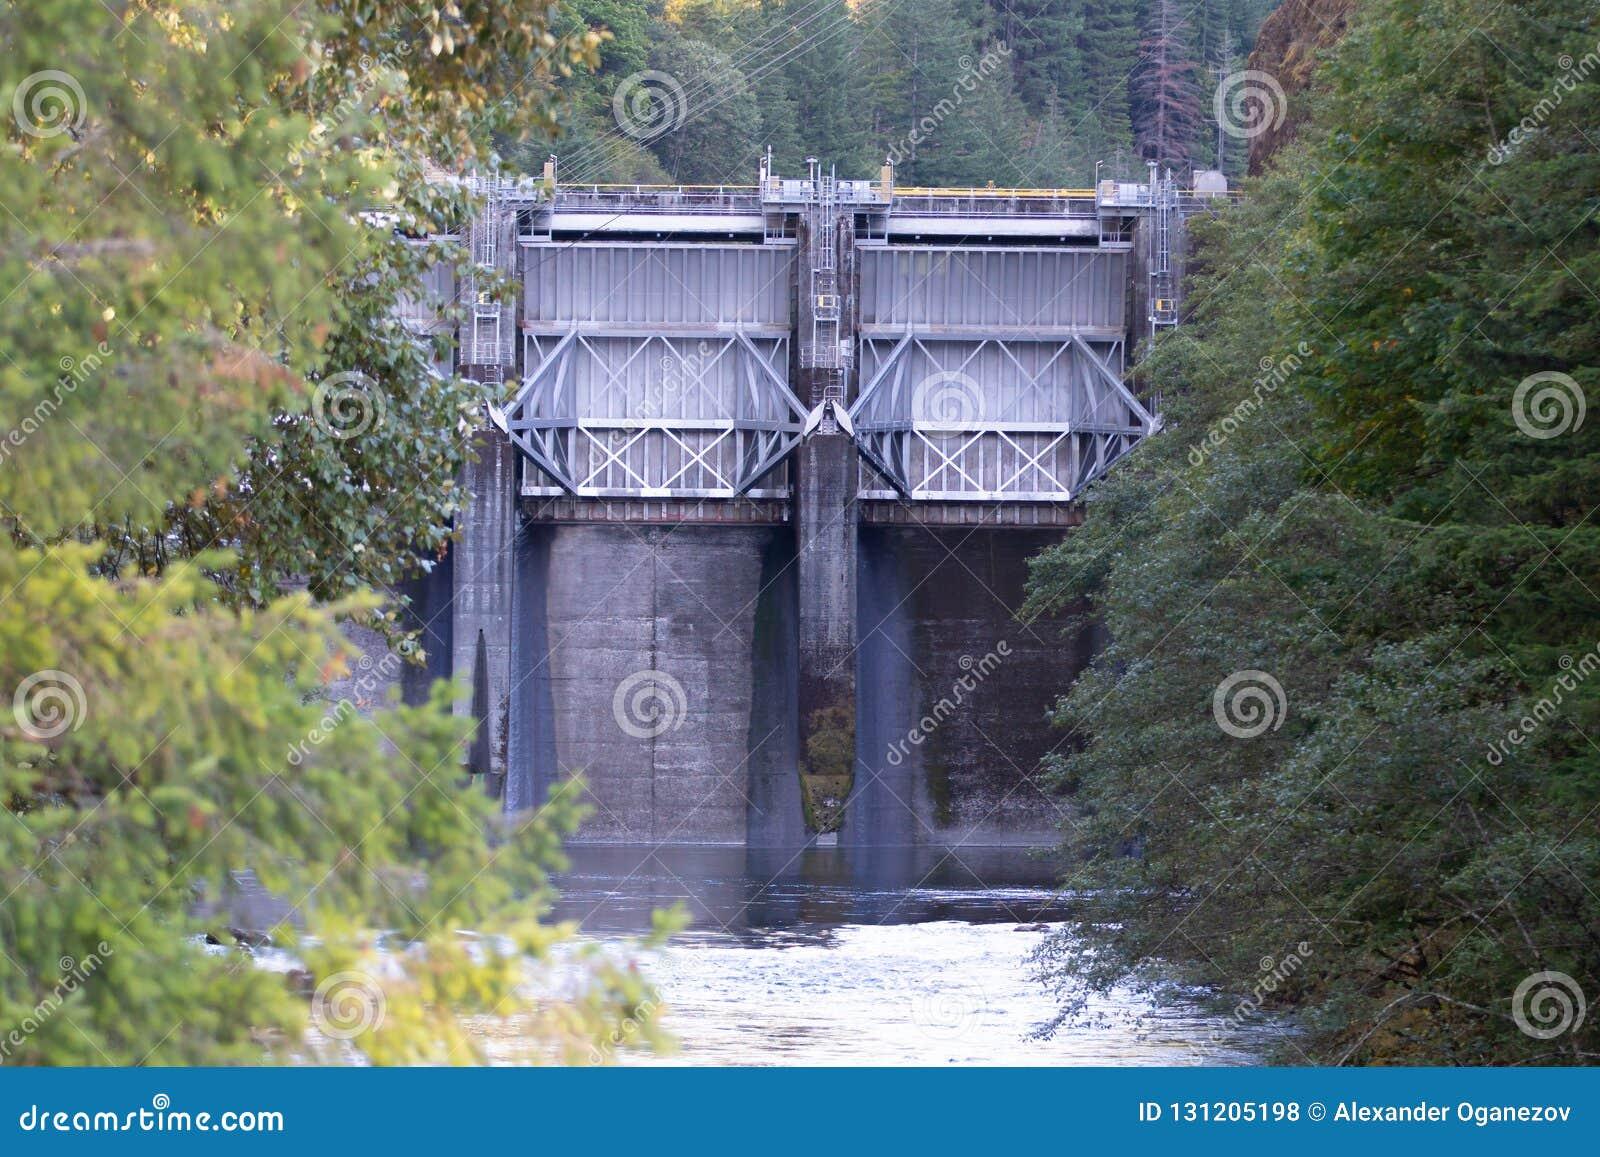 Stahlempfangverdammung auf dem Oregon-Fluss